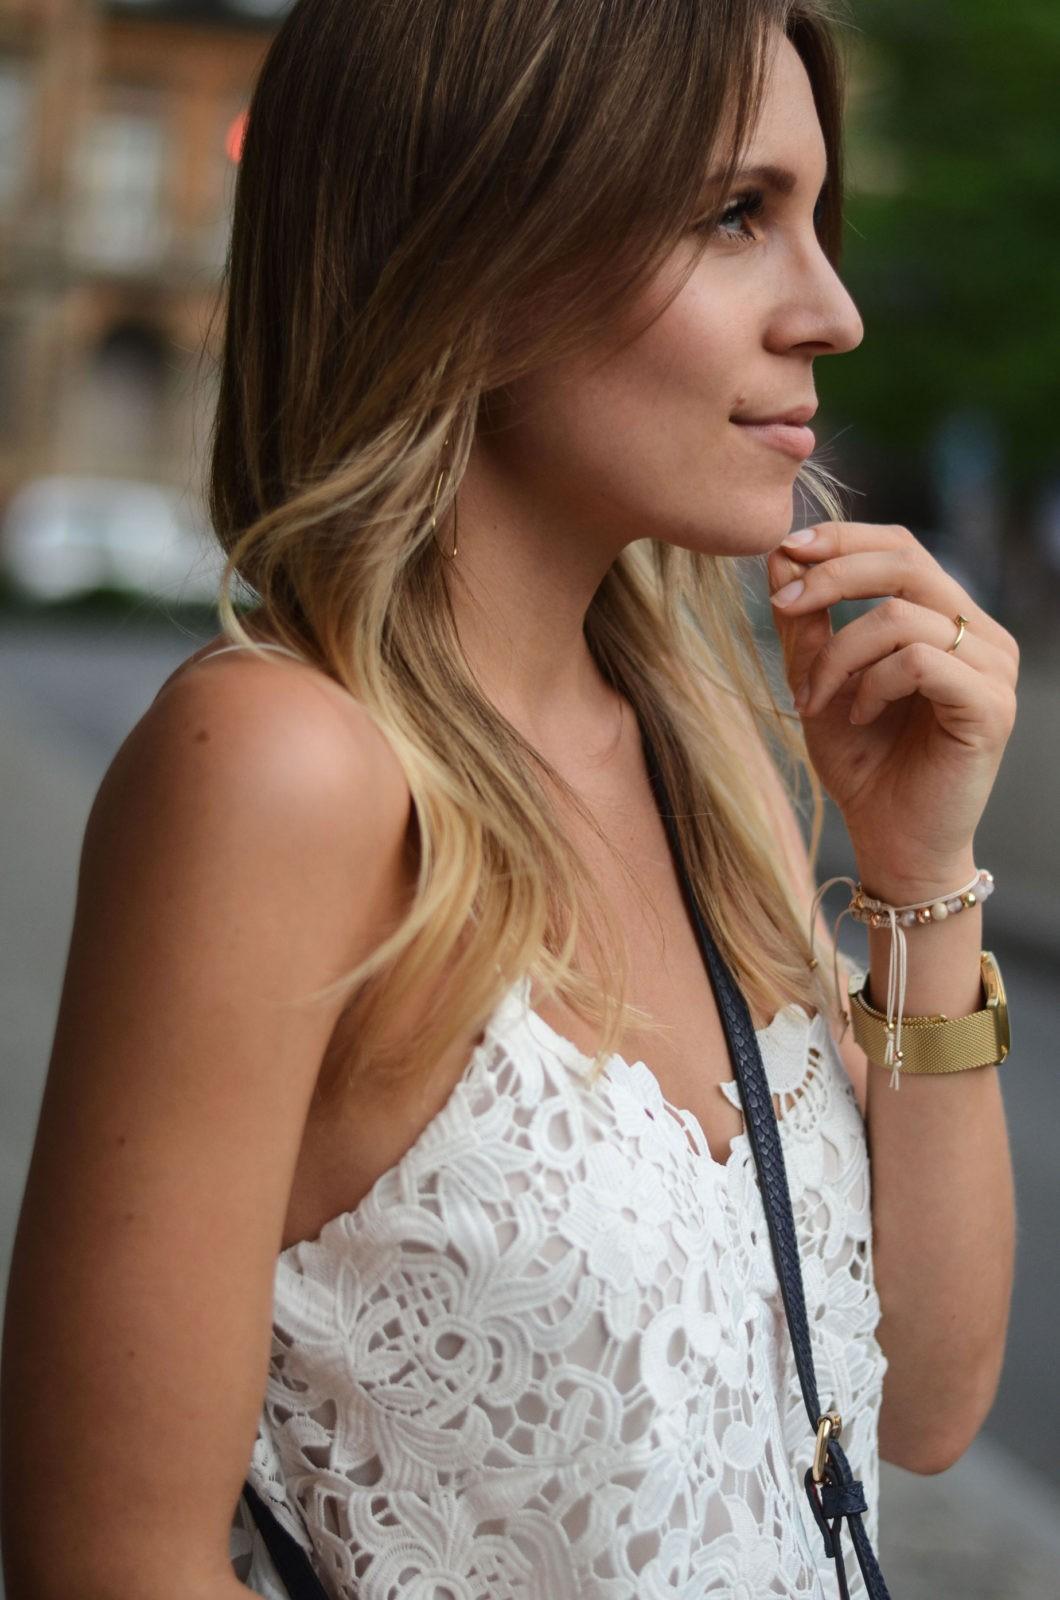 Sariety-modeblog-heidelberg-sarah-czok-fashionblogger-zara-spitzenkleid-superga-aldo-bag-17